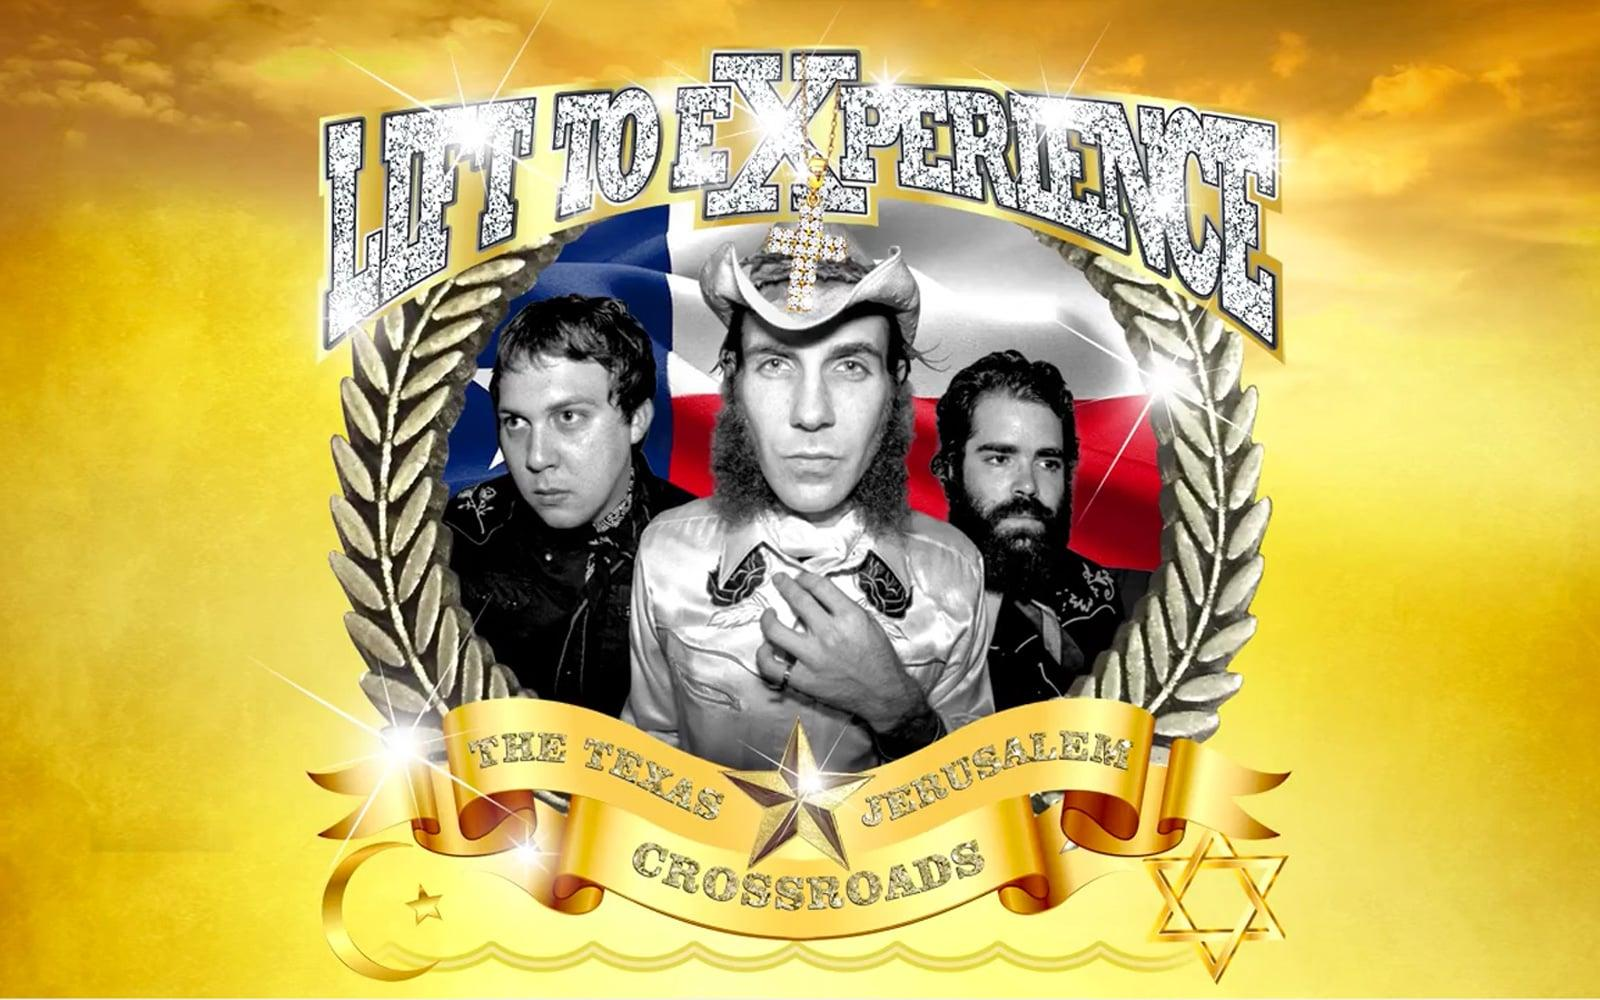 The Texas-Jerusalem Crossroads 2017